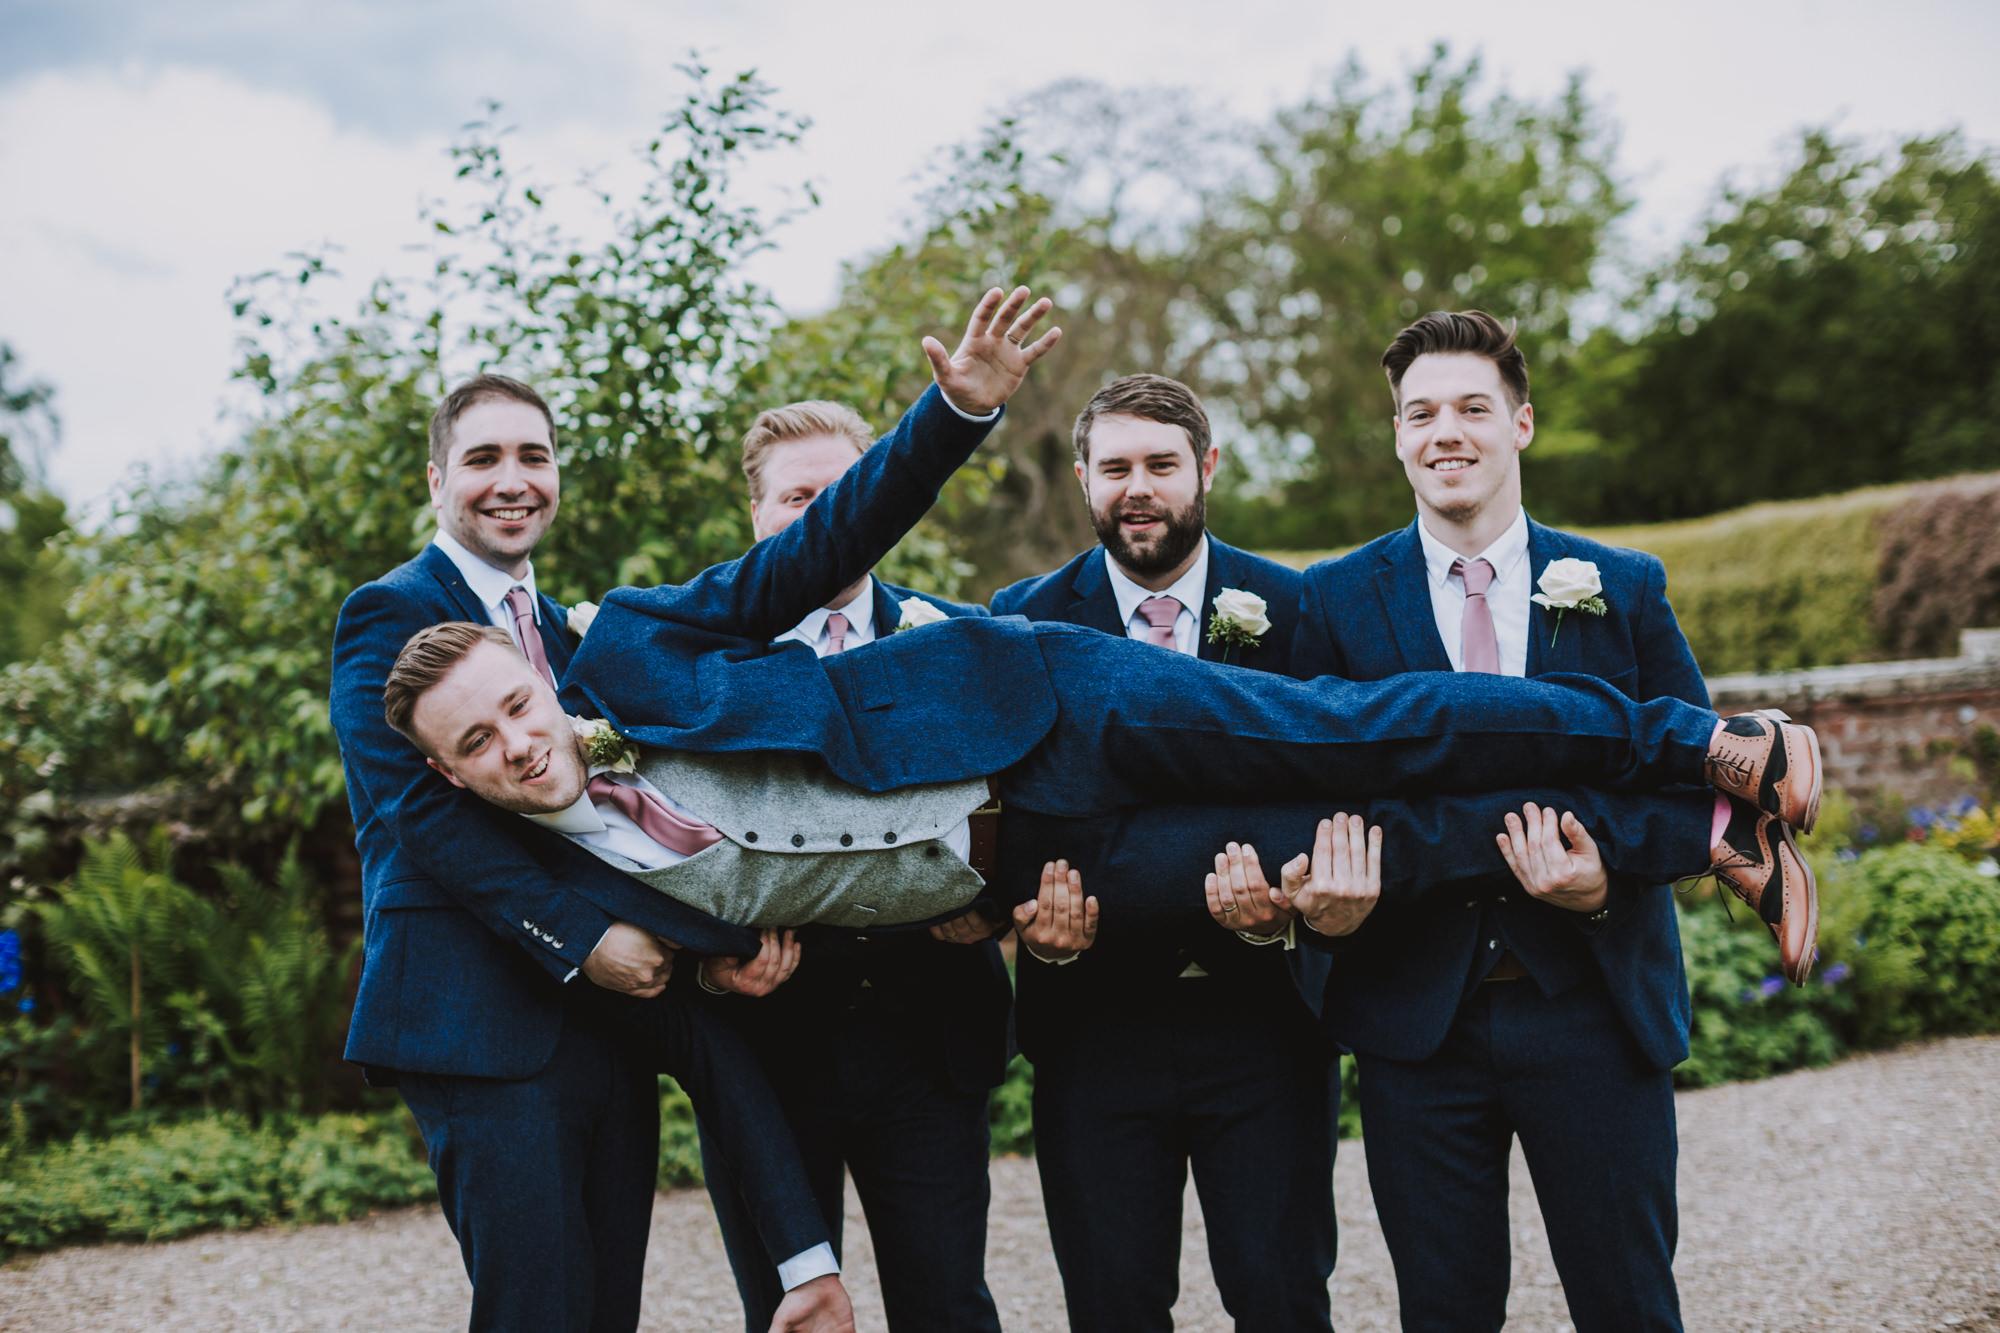 hodsock priory wedding photographers blog53.jpg